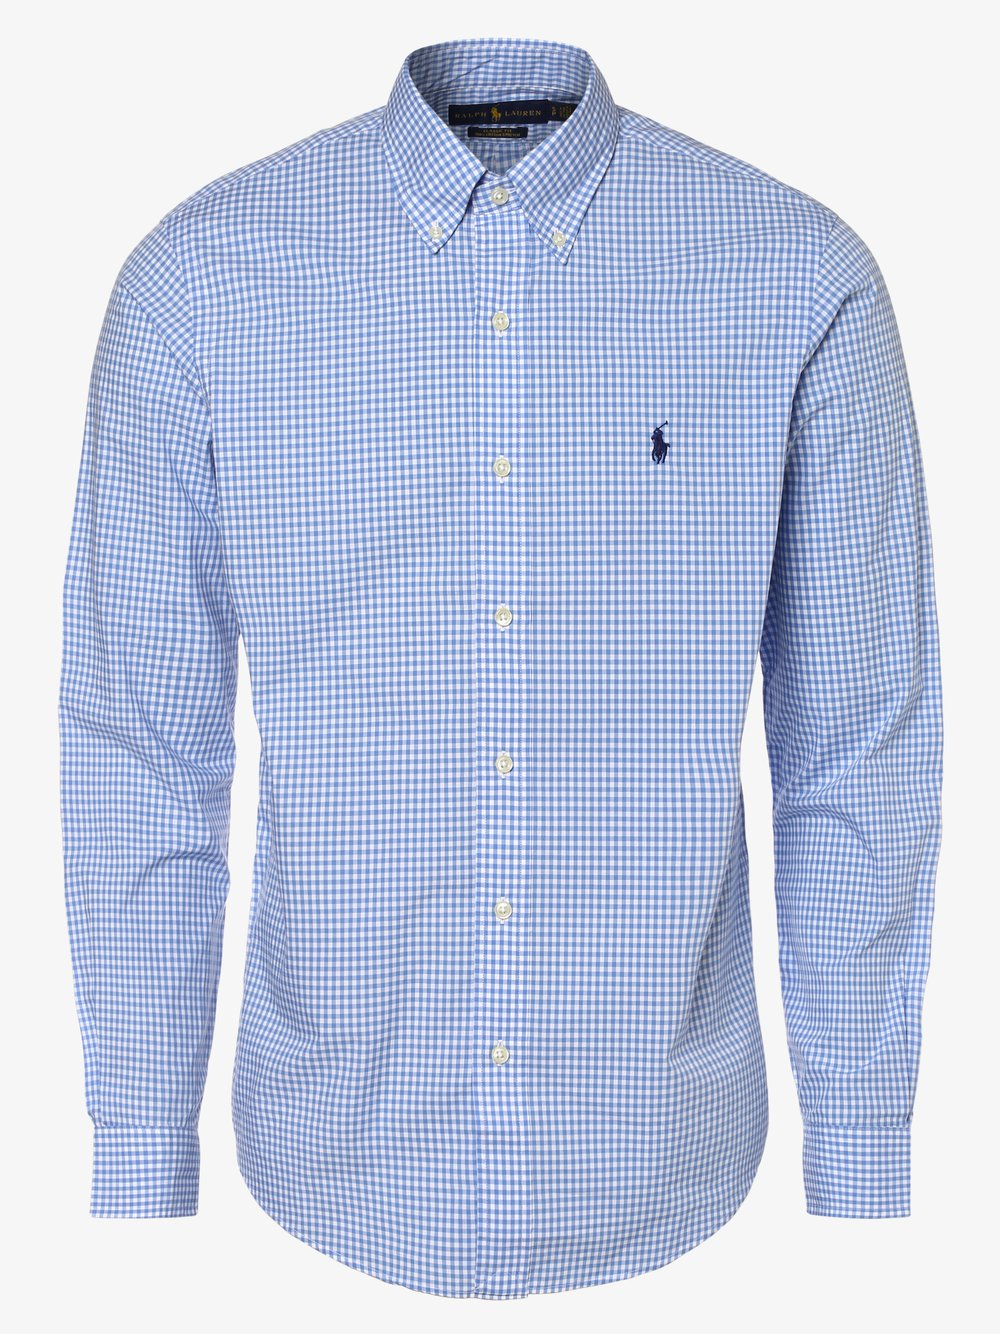 Polo Ralph Lauren Koszula męska – Classic Fit kup online  eeajj